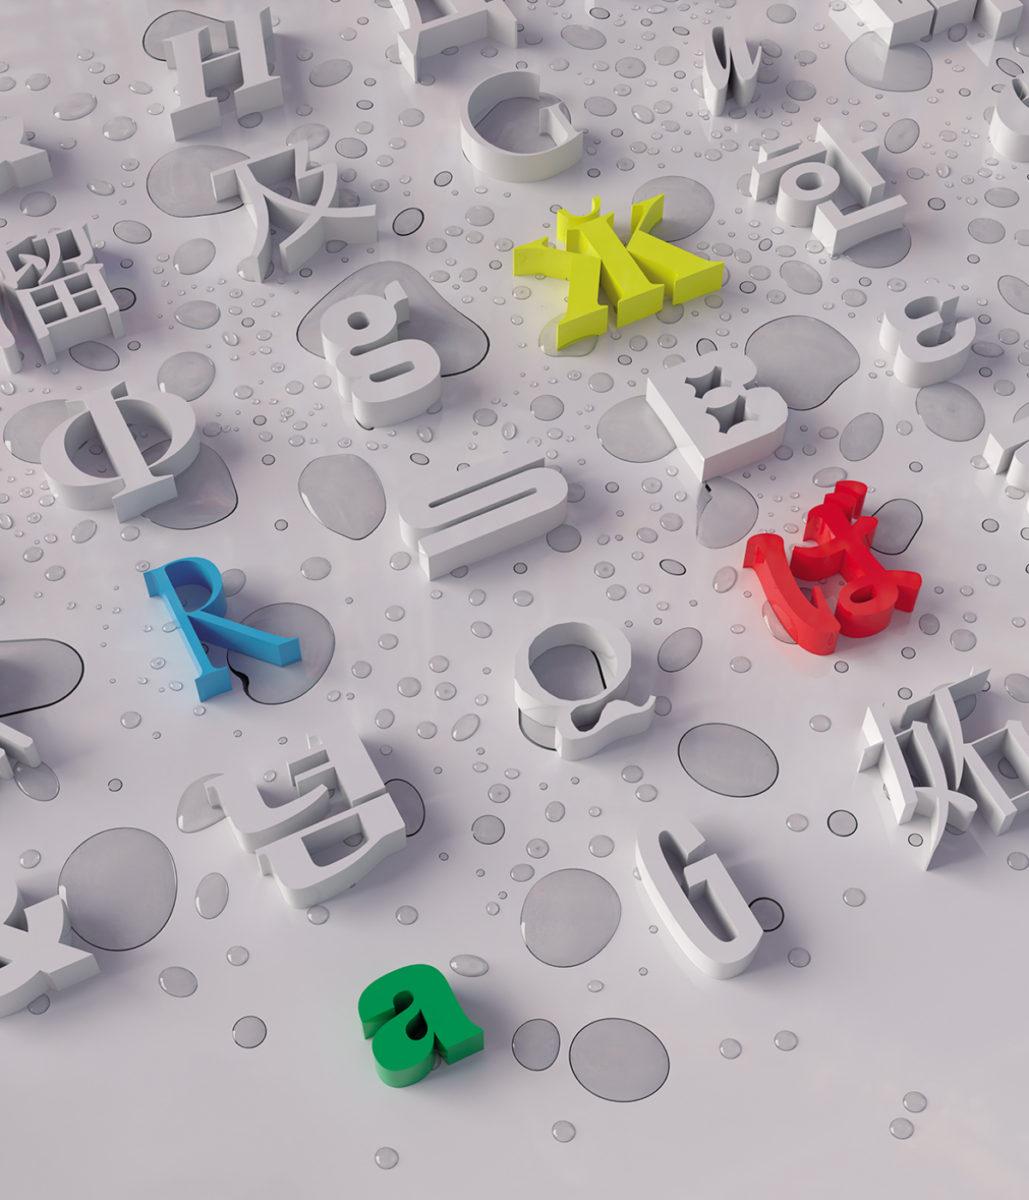 Production Type 3D Letterings